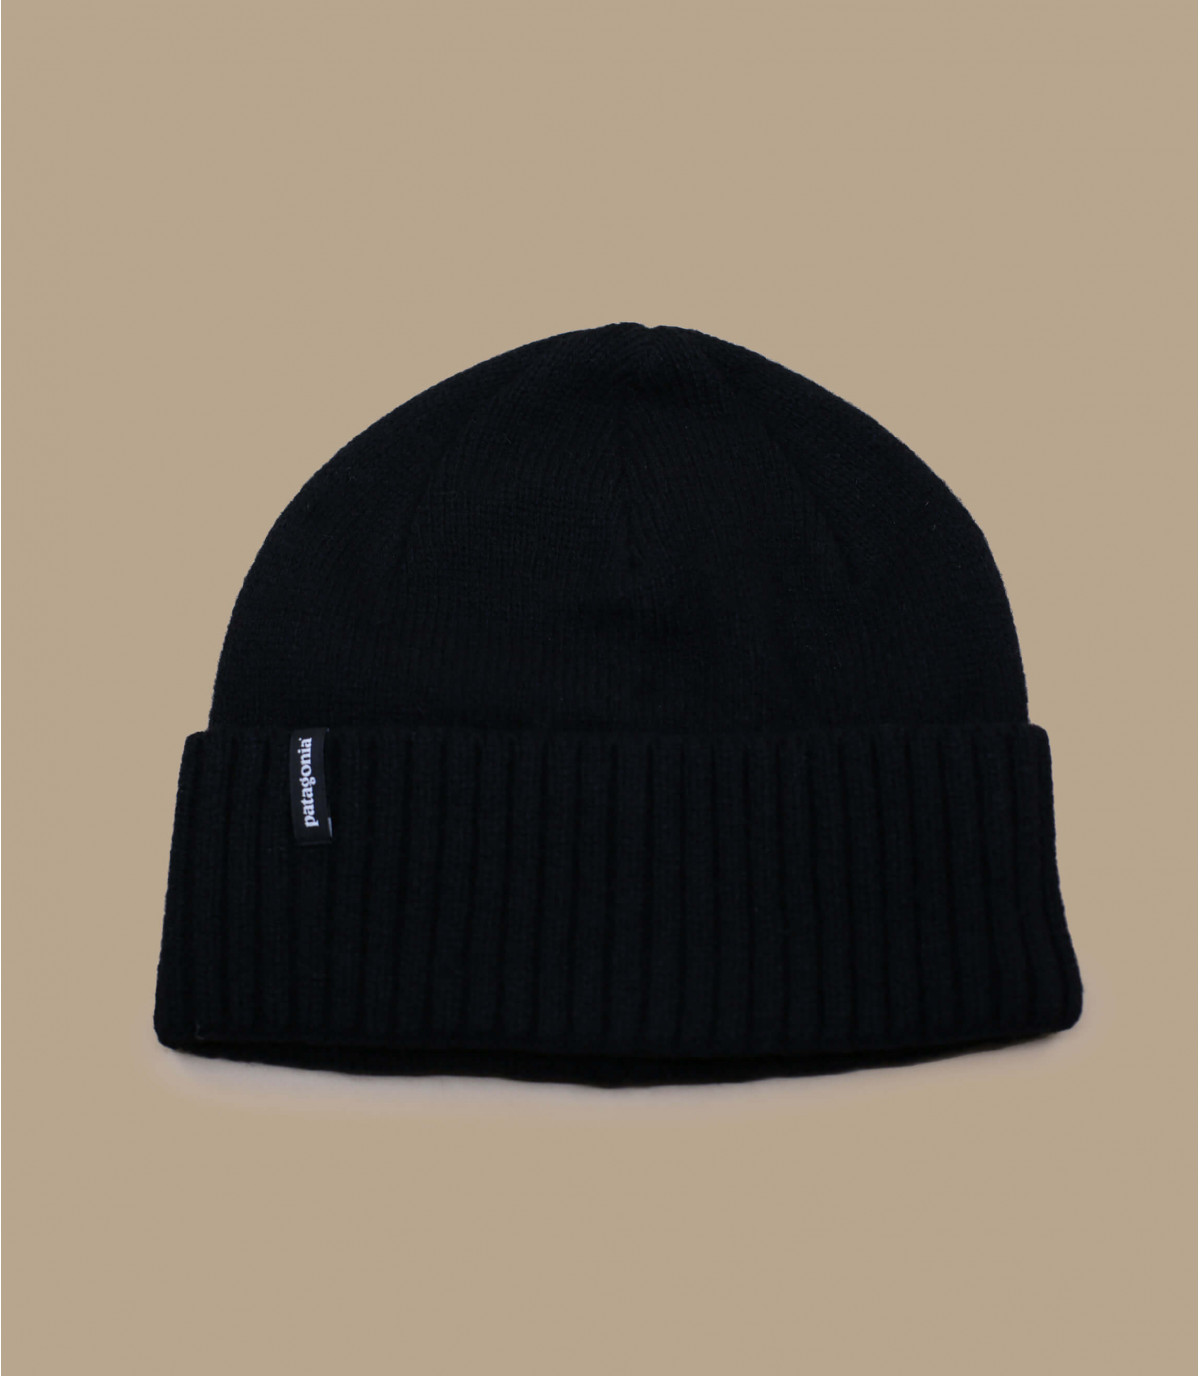 Dettagli Brodeo beanie black - image 2